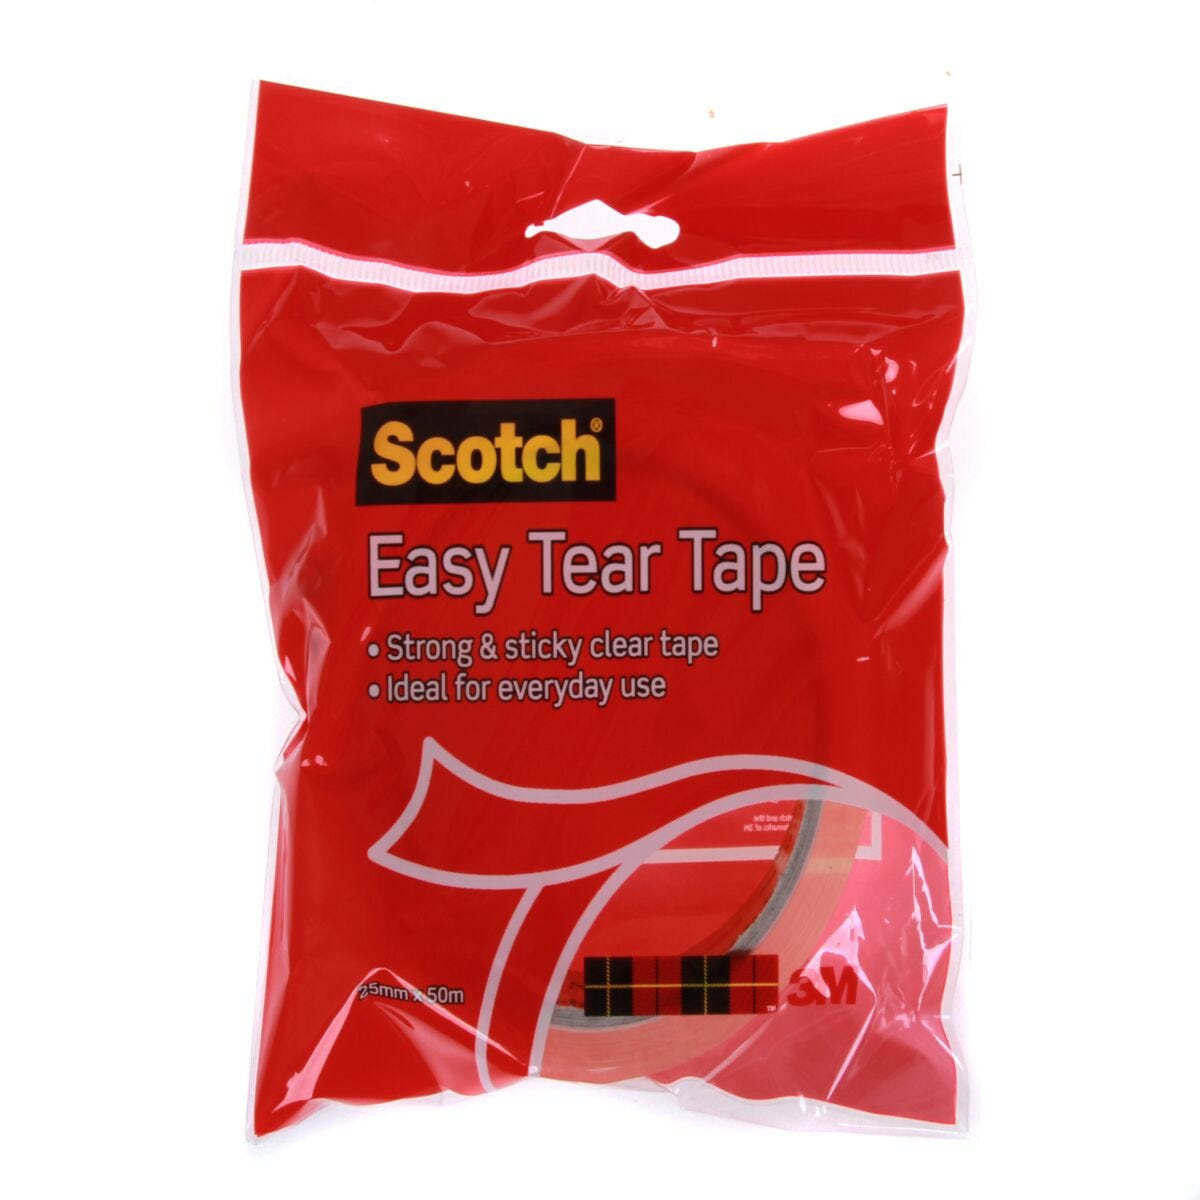 Scotch Easy Tear Tape 25mmx50m